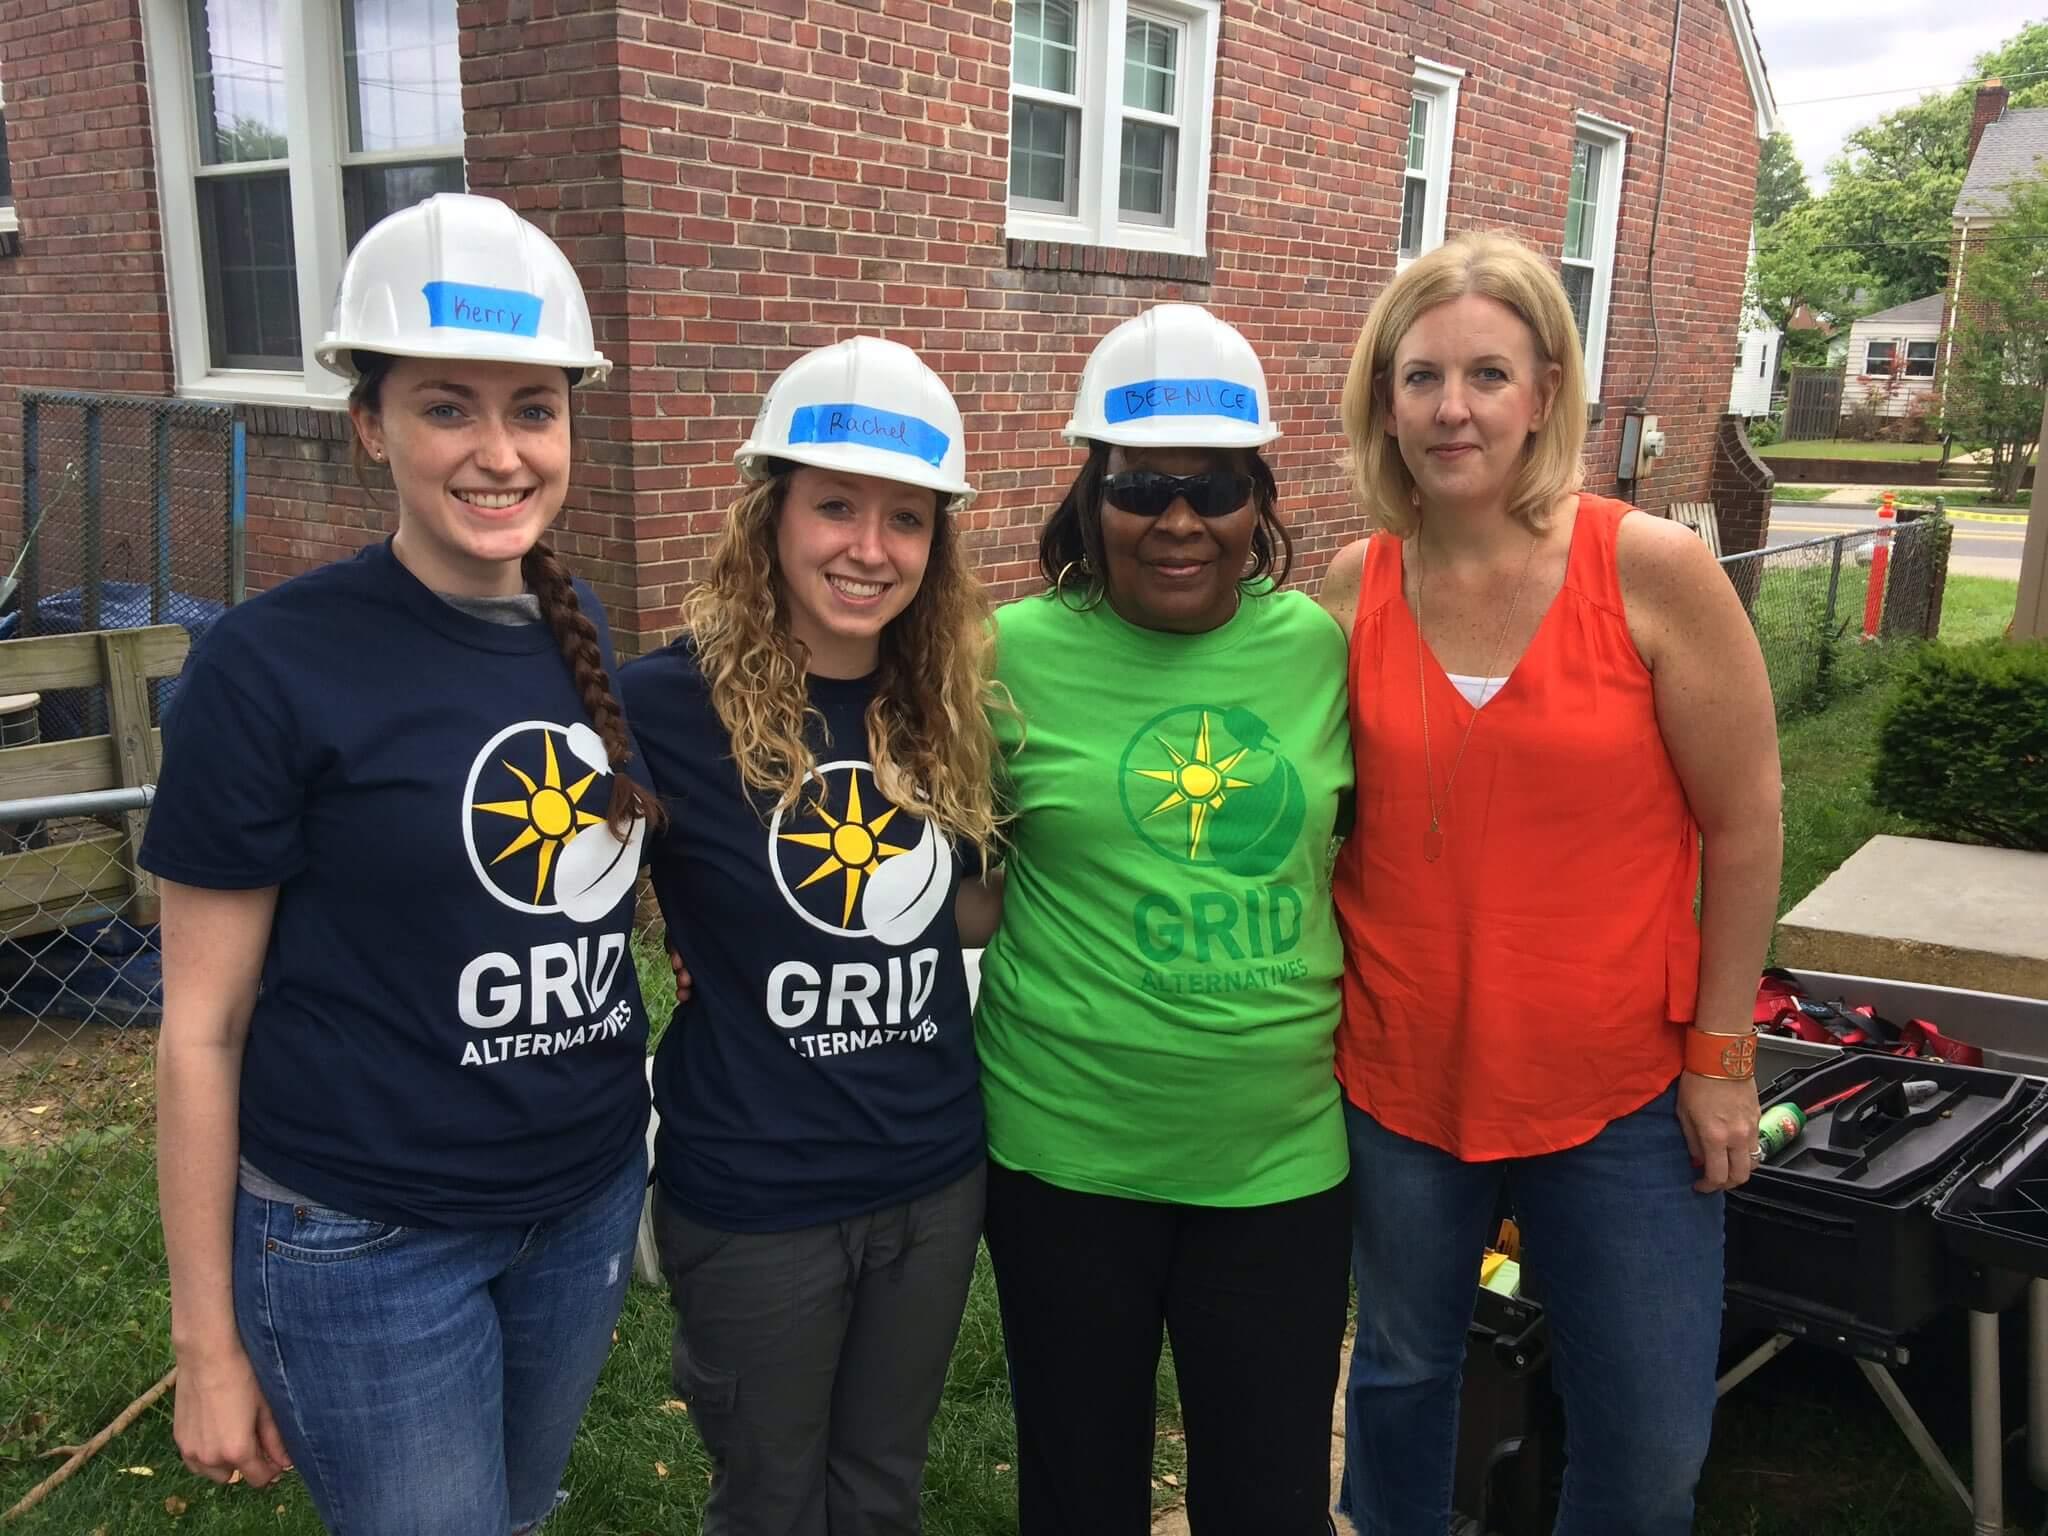 SEIA-1 GRID Alternatives, SEIA Kick Off Women In Solar Program